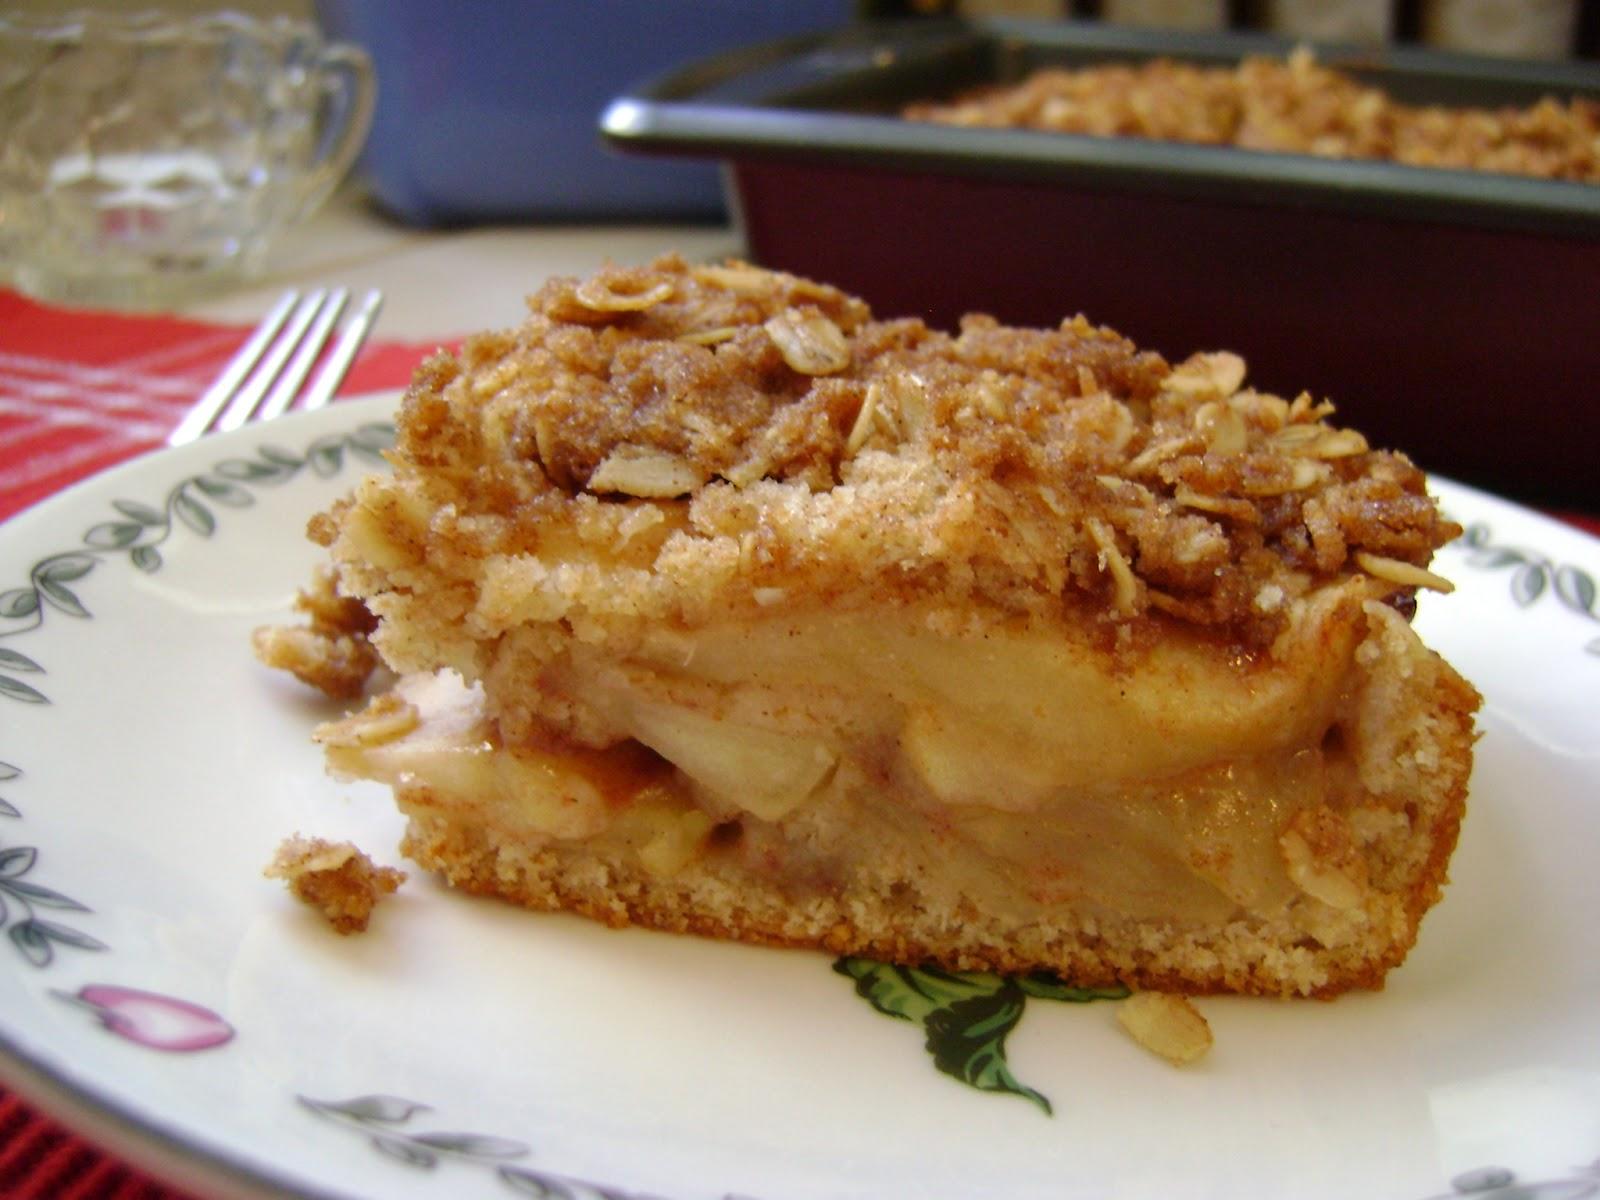 A Sunflower Life: Apple Cinnamon Coffee Cake